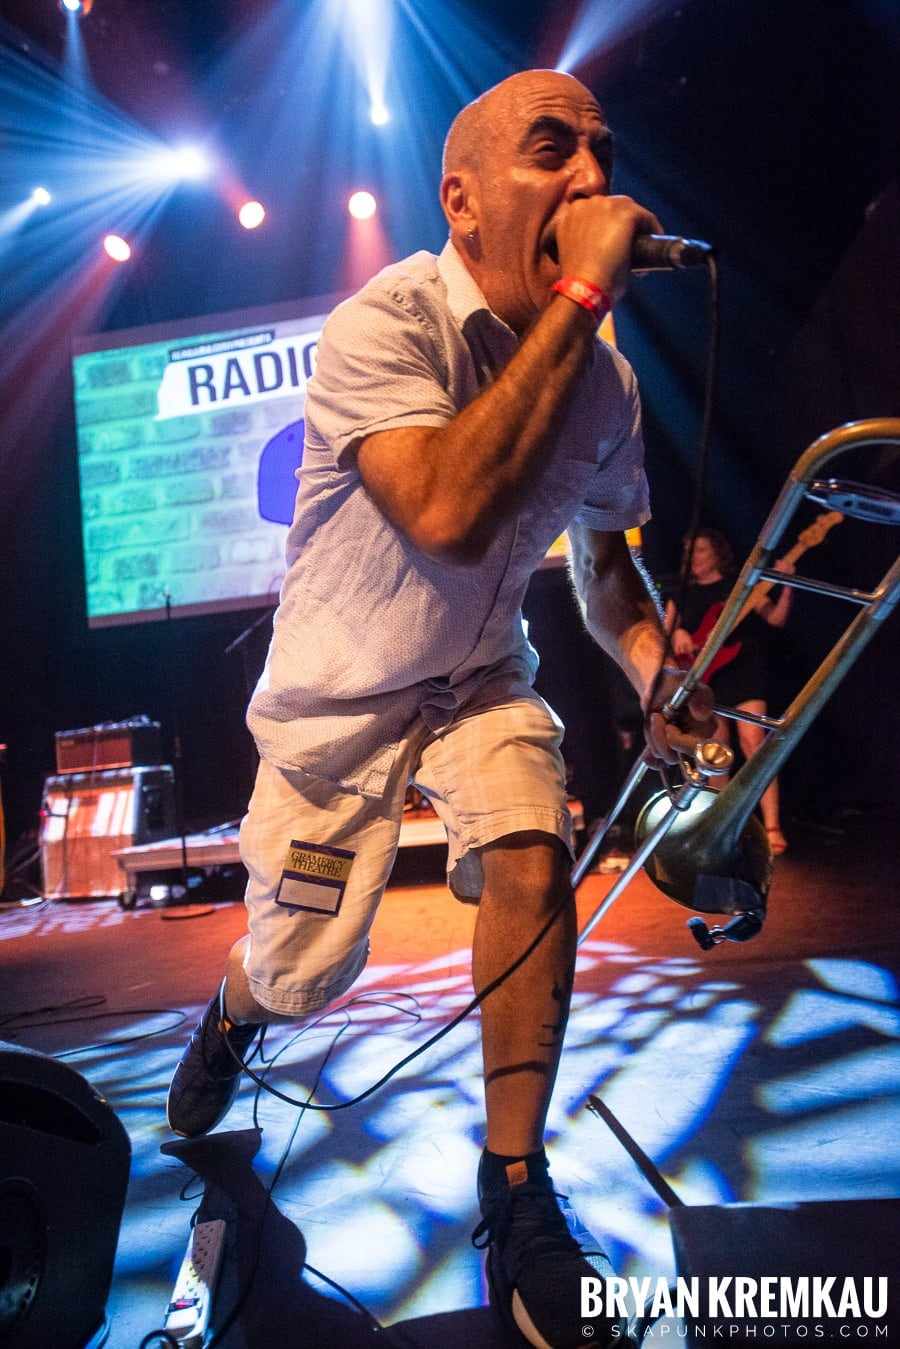 Radicsfest 2019 @ Gramercy Theatre, NYC - Pilfers, Mephiskapheles, Spring Heeled Jack, Hub City Stompers, Rude Boy George, Sgt. Scagnetti (110)